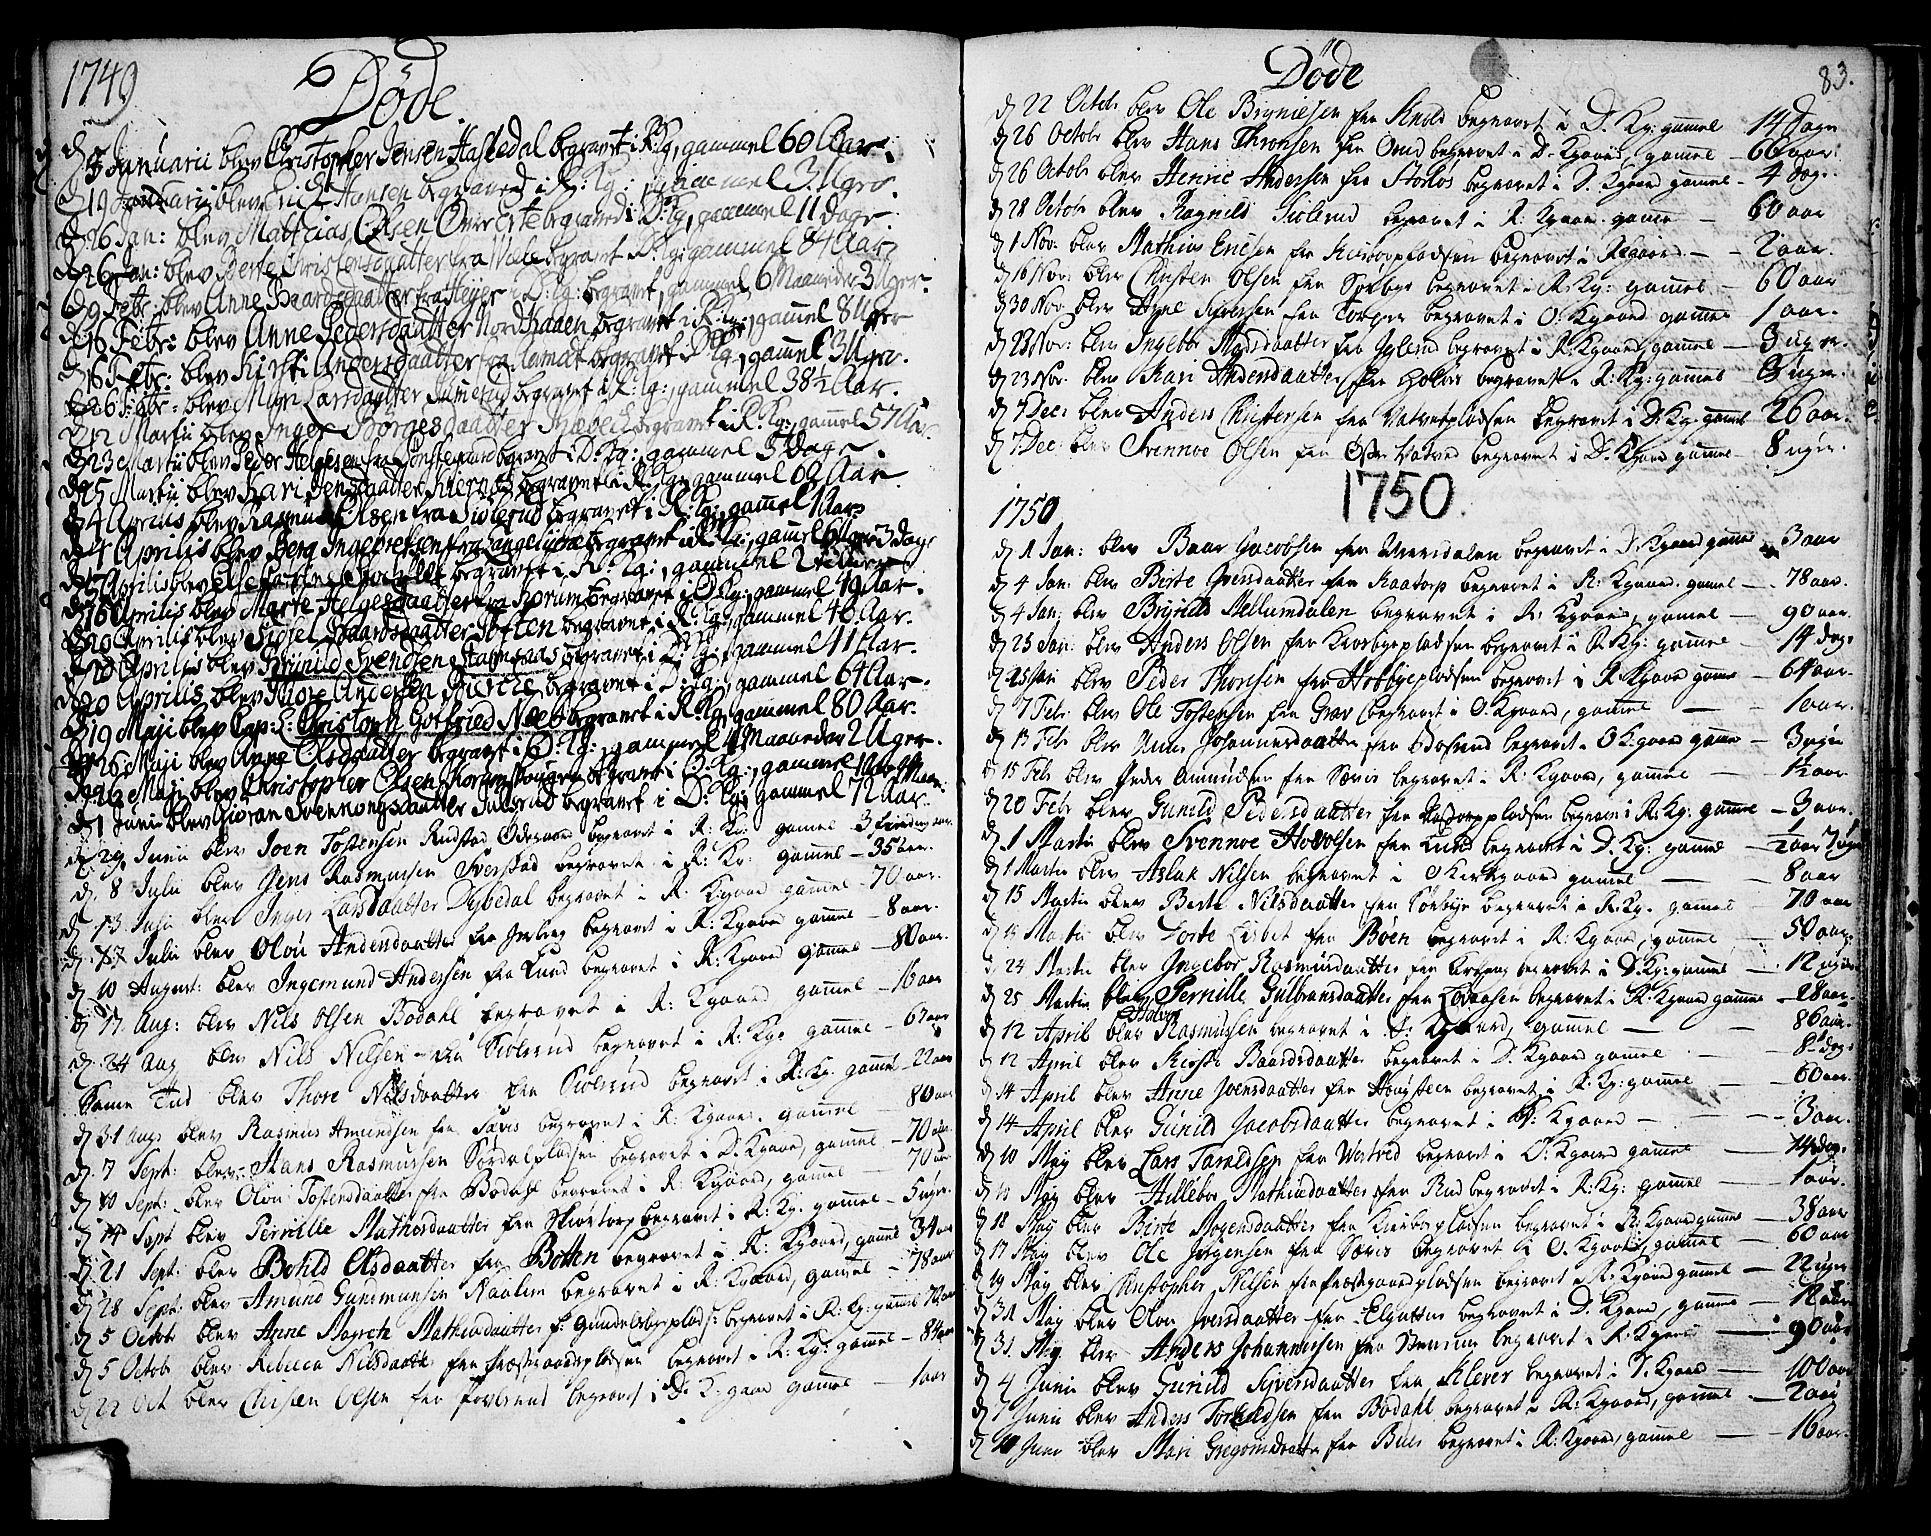 SAO, Rakkestad prestekontor Kirkebøker, F/Fa/L0002: Ministerialbok nr. I 2, 1741-1751, s. 83